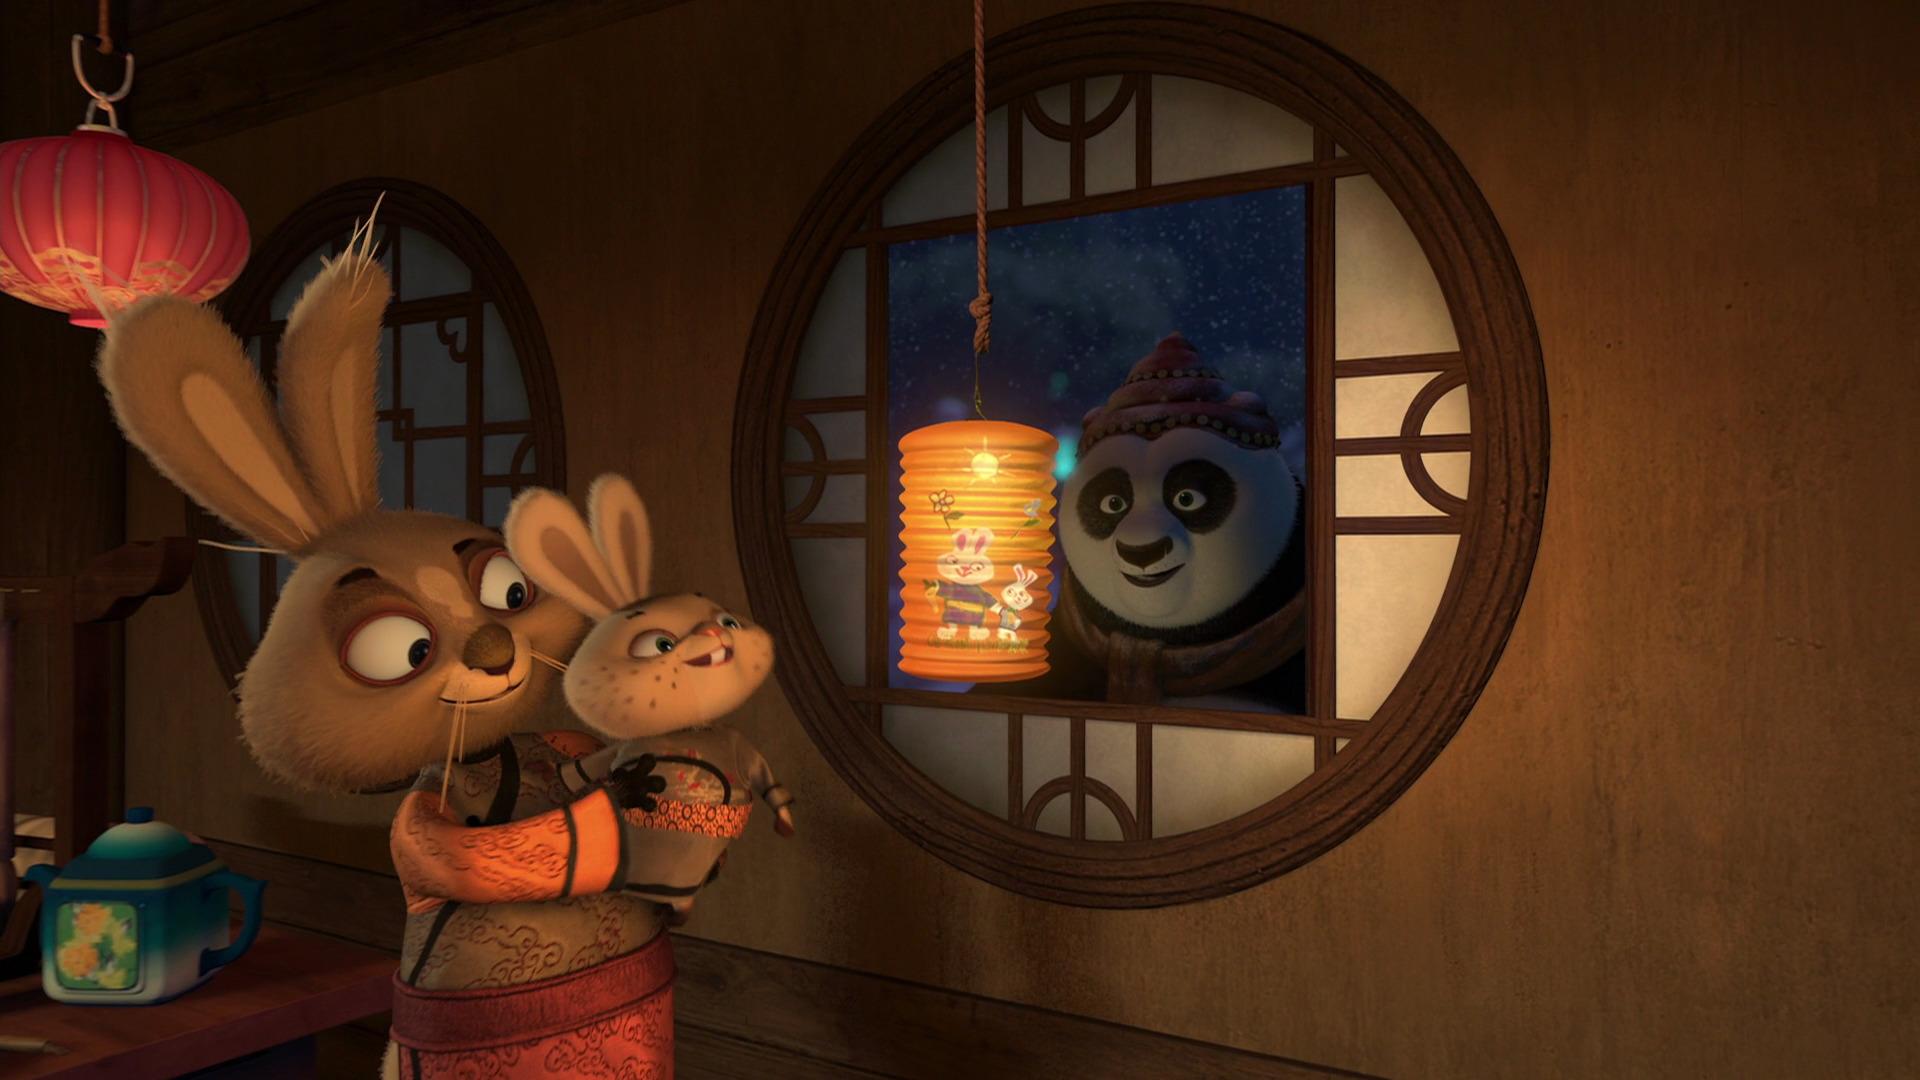 Kung Fu Panda Holiday Special 720p HDTV-KmG.mkv snapshot 14.36 -2012.02.13 18.05.13-.jpg